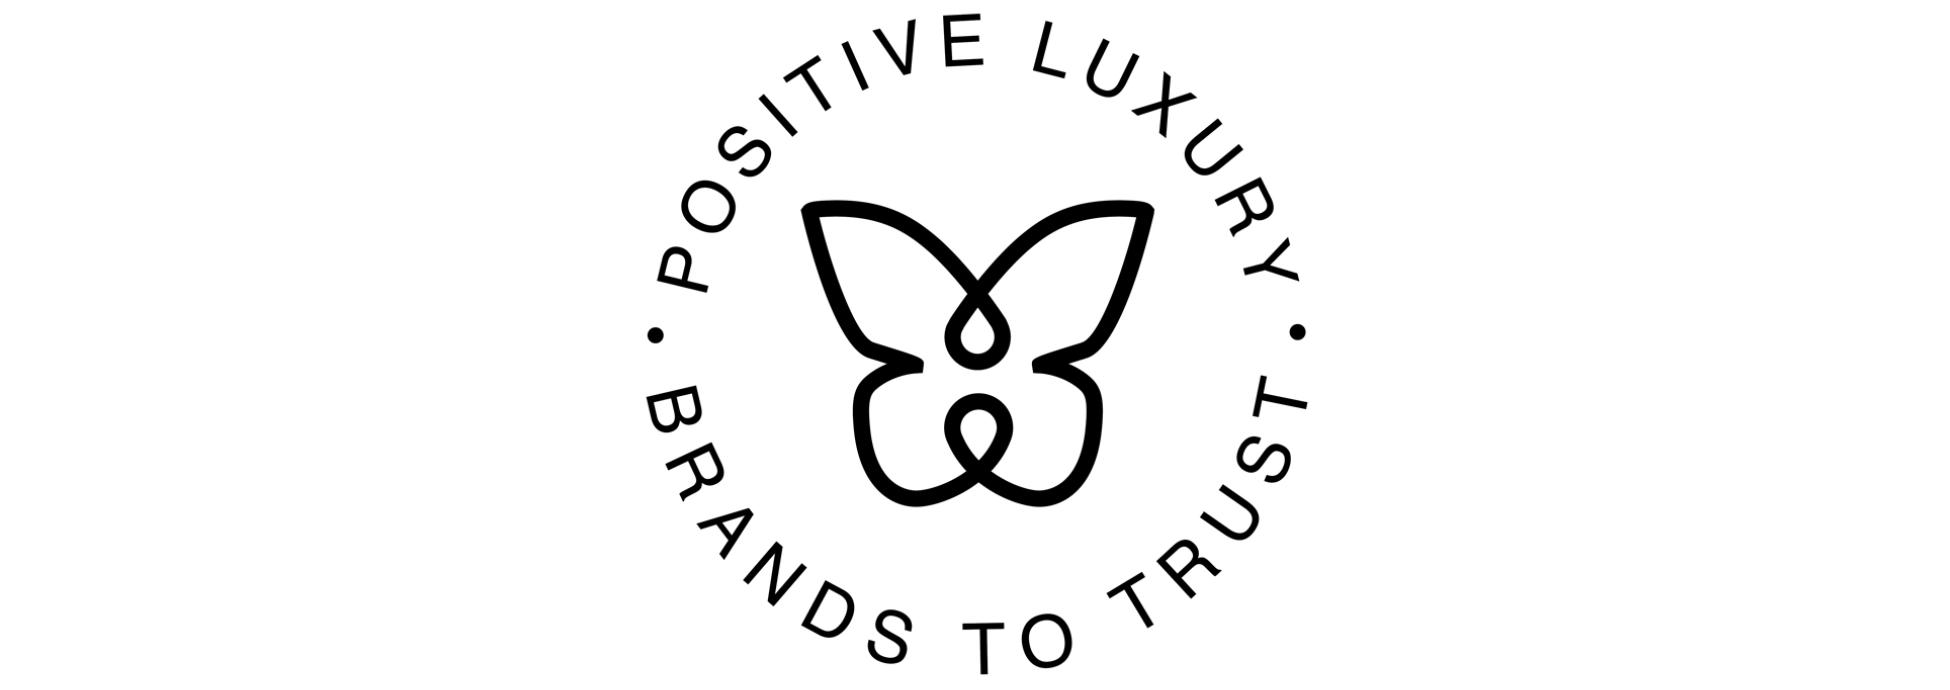 PositiveLuxuryButterflyMark.png